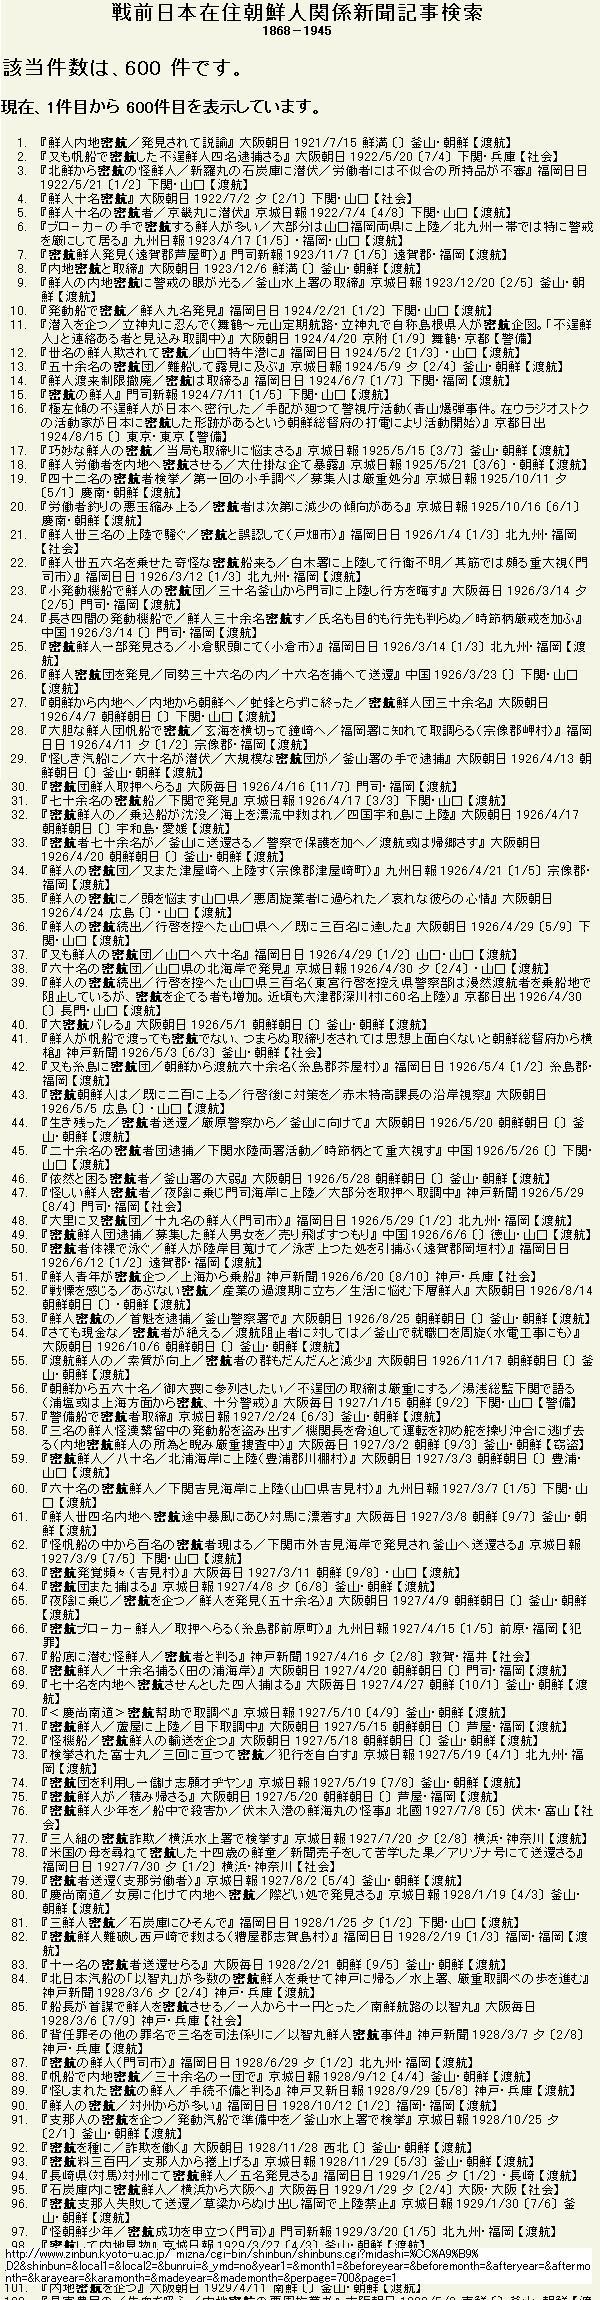 http://blogimg.goo.ne.jp/user_image/11/2a/145350be4ef35eb483ea7799460ecd5f.jpg